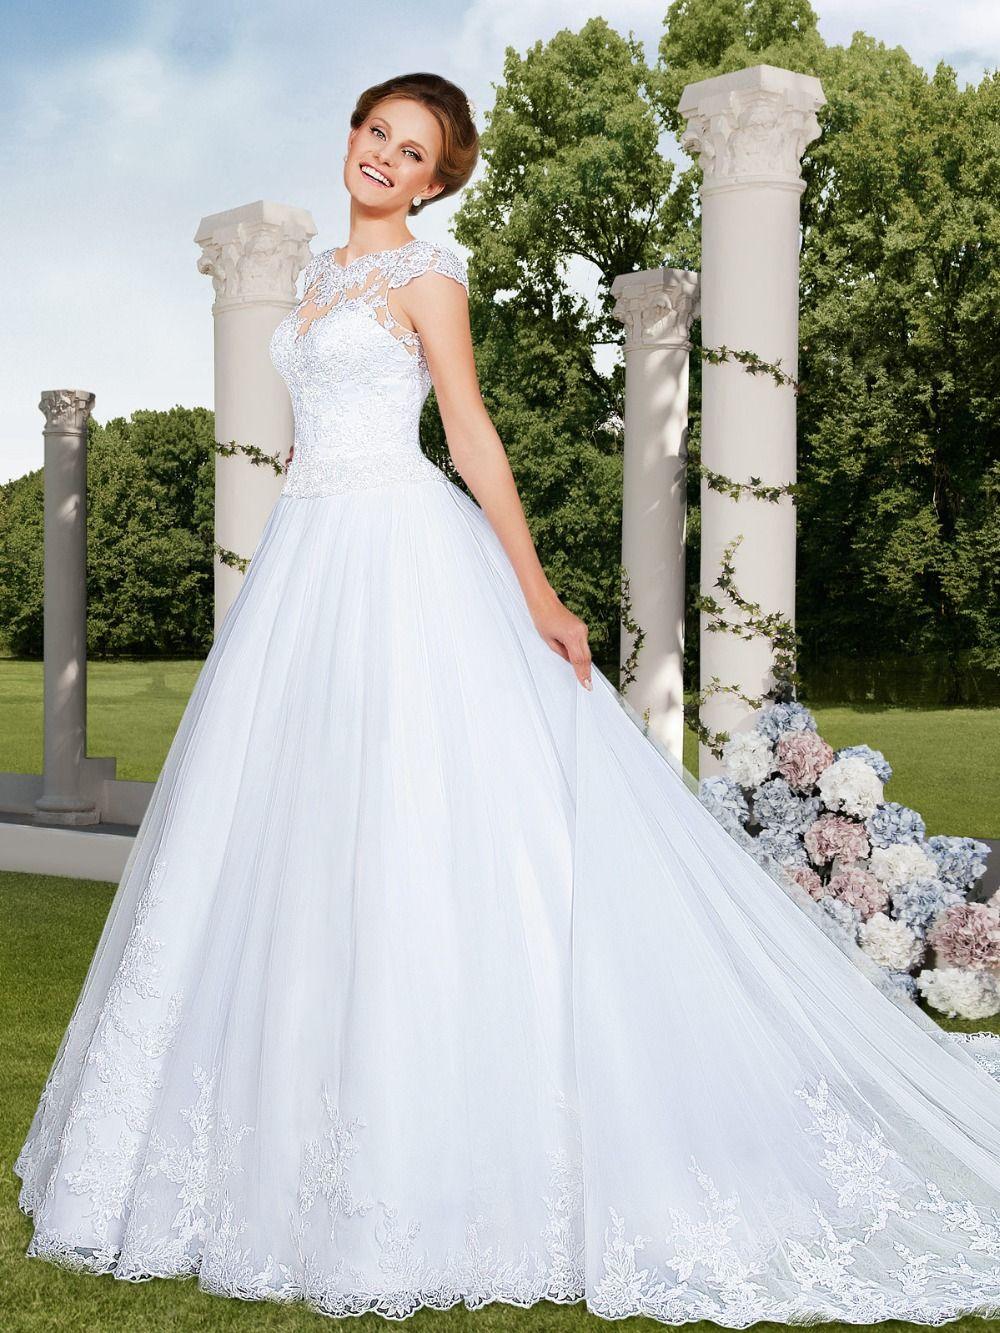 Wedding decorations muslim october 2018 bridalup SUPPLIES Fashionable White Scoop Neckline Cap Sleeve